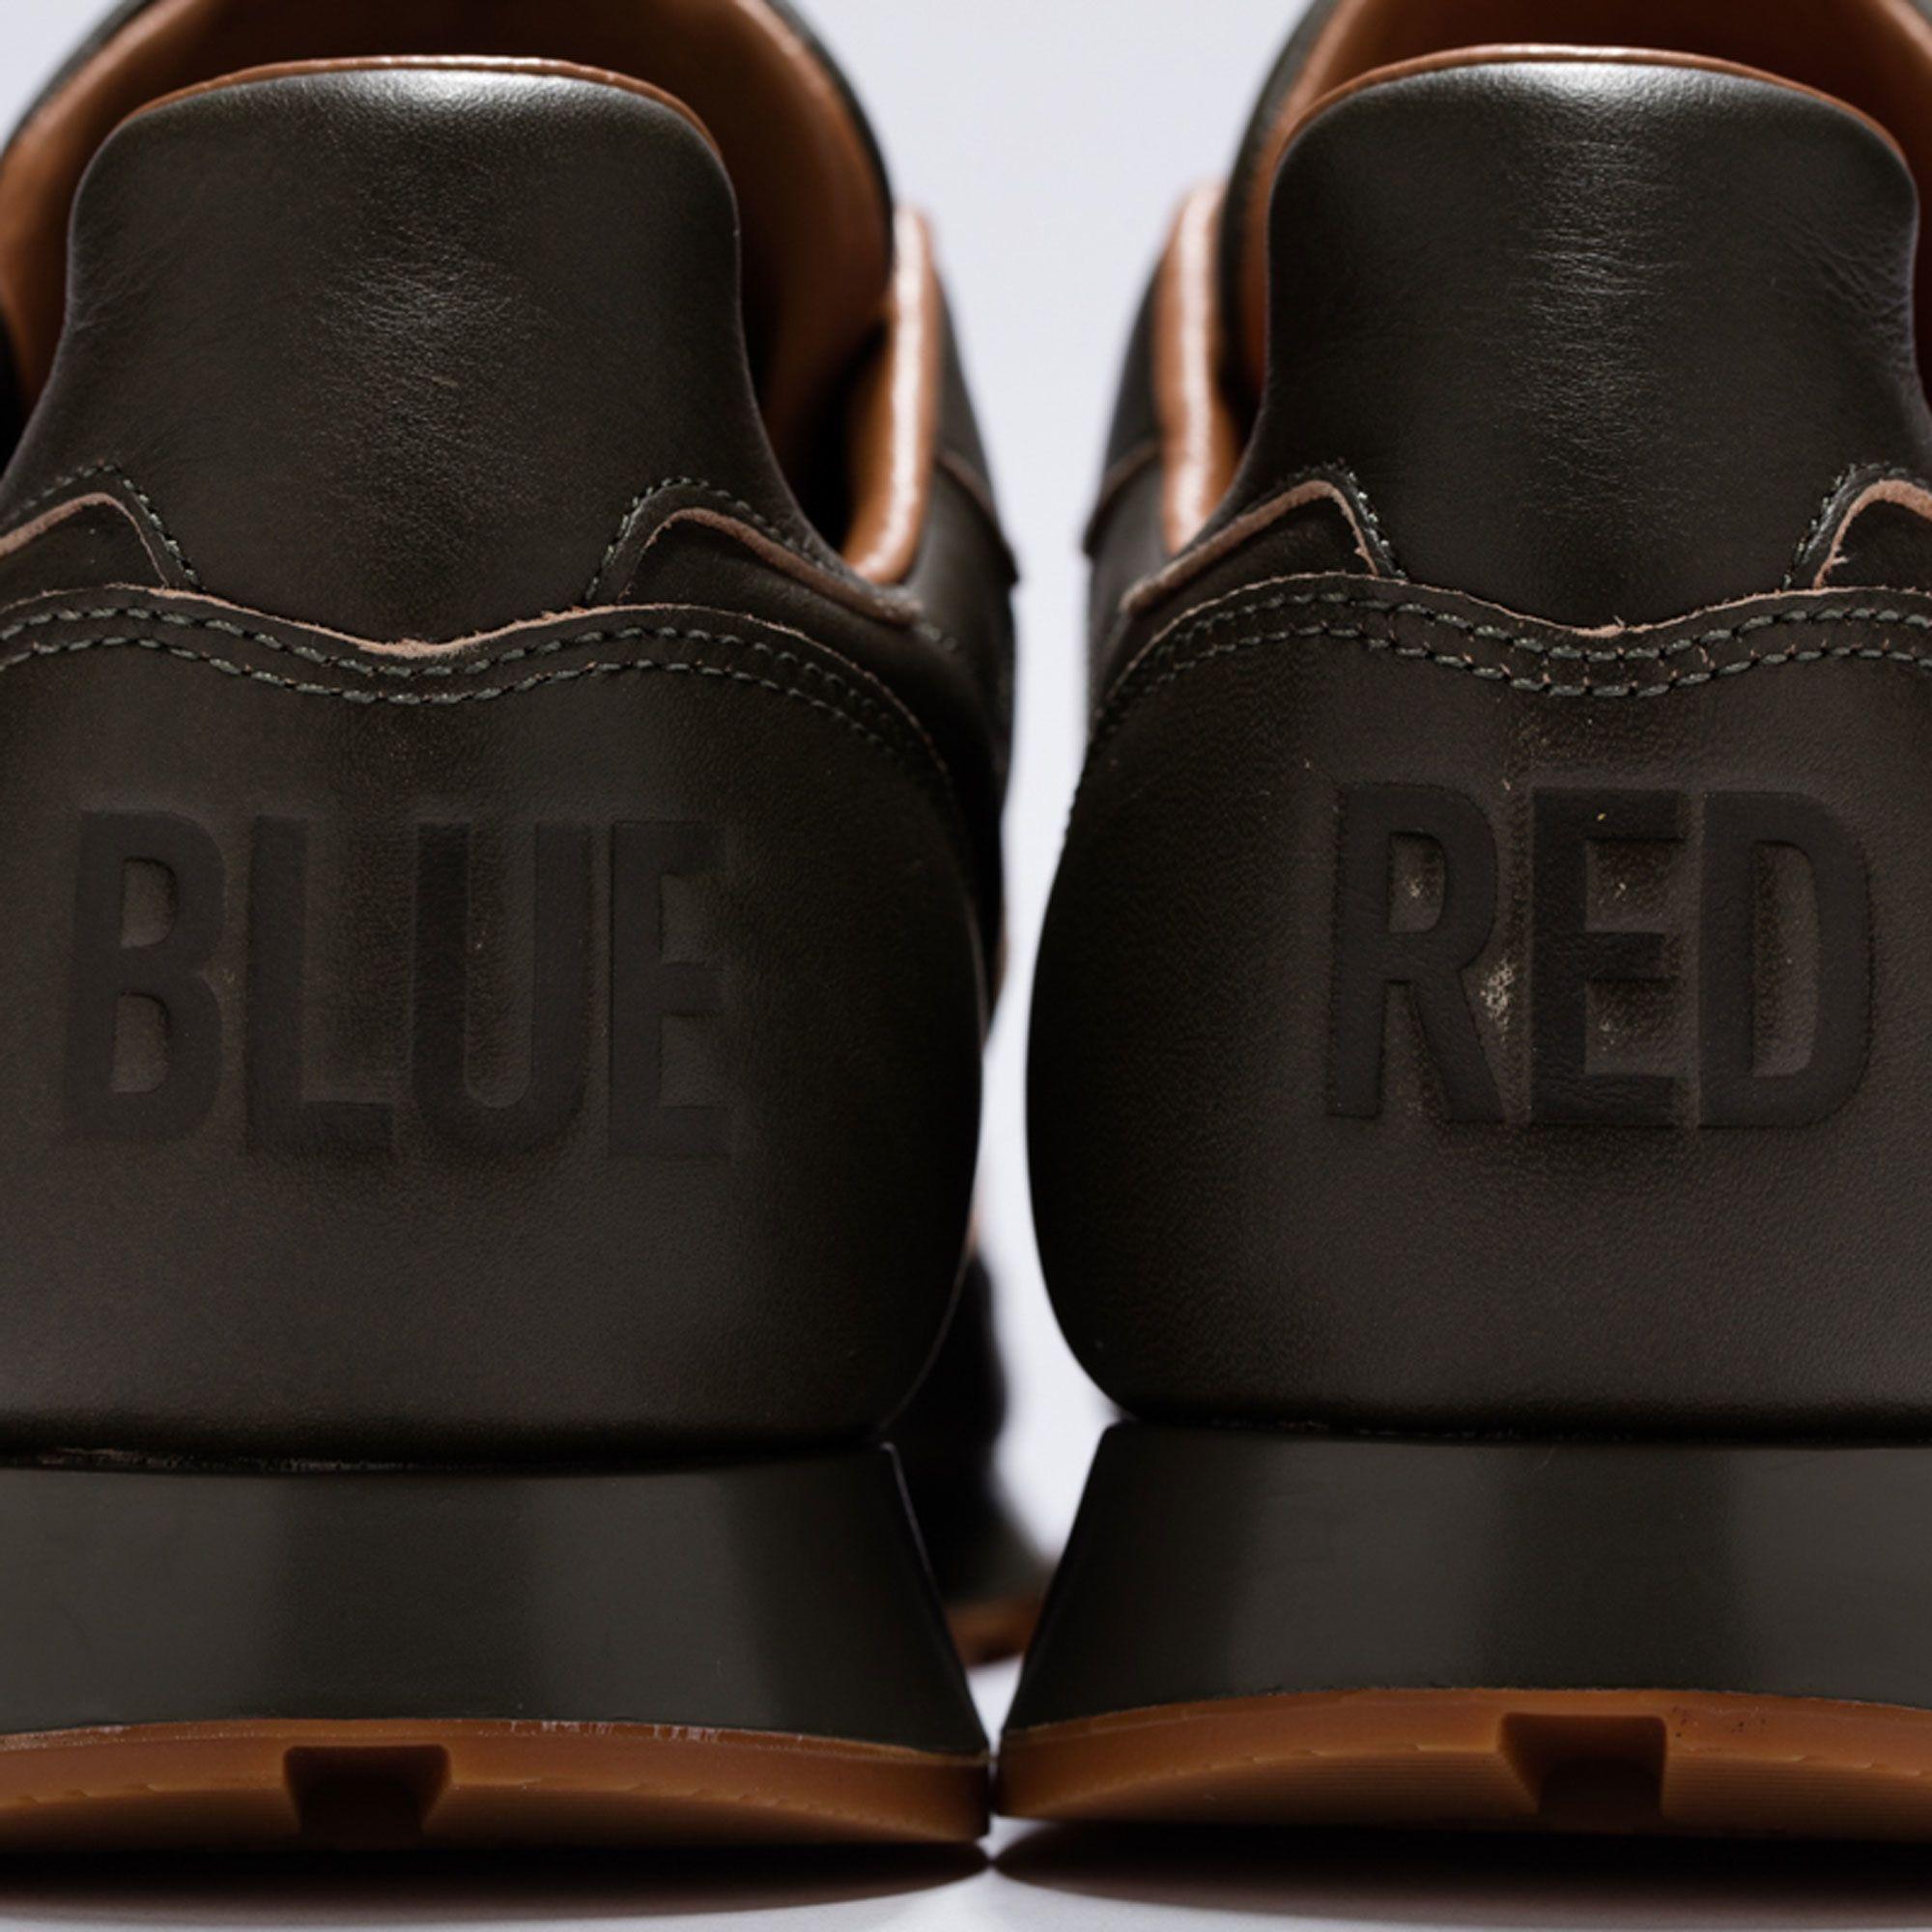 Movilizar Sucediendo Impresión  Limited Time Deals·New Deals Everyday reebok classic leather lux kendrick  lamar, OFF 77%,Buy!